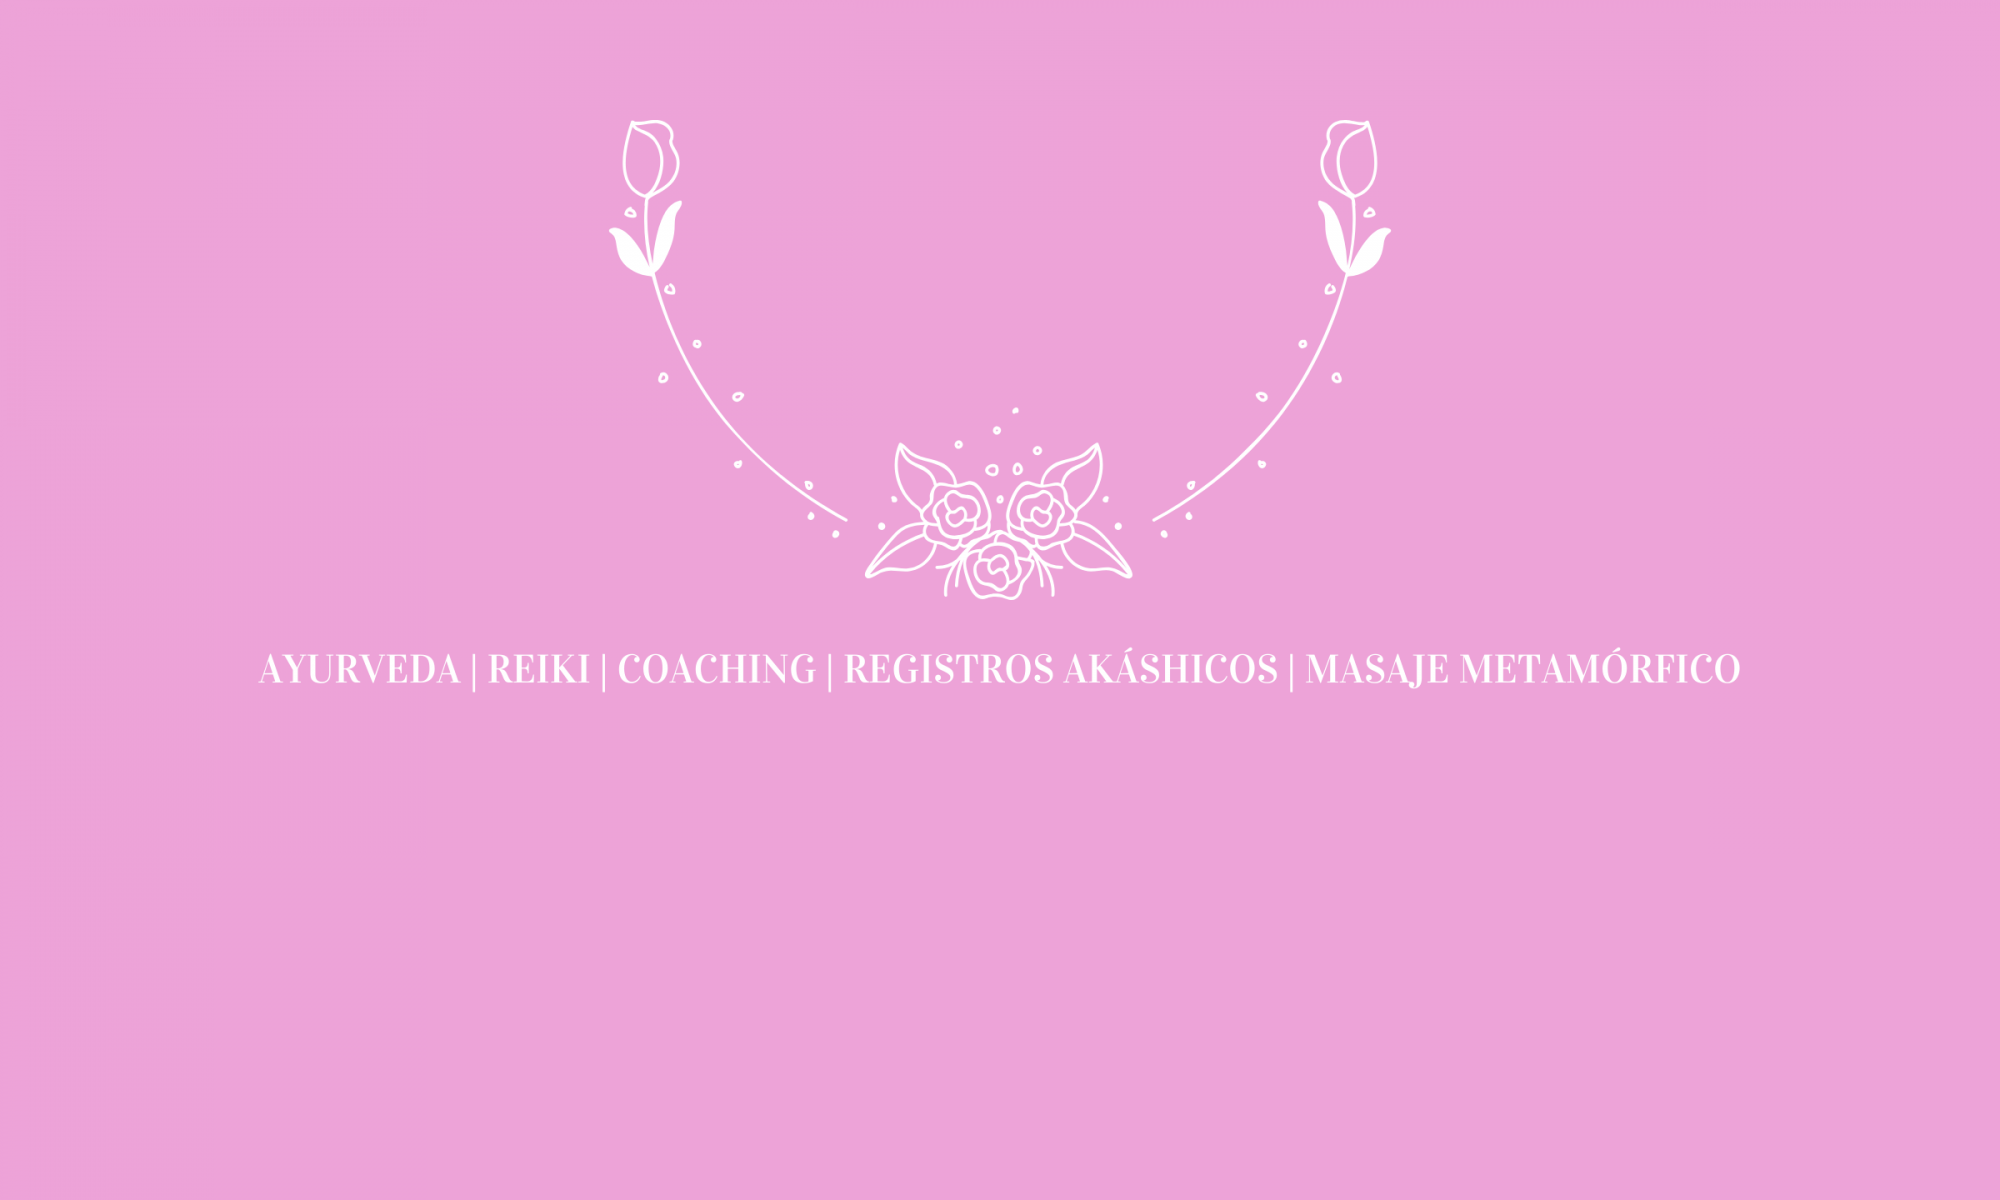 Best Wishes Transformación